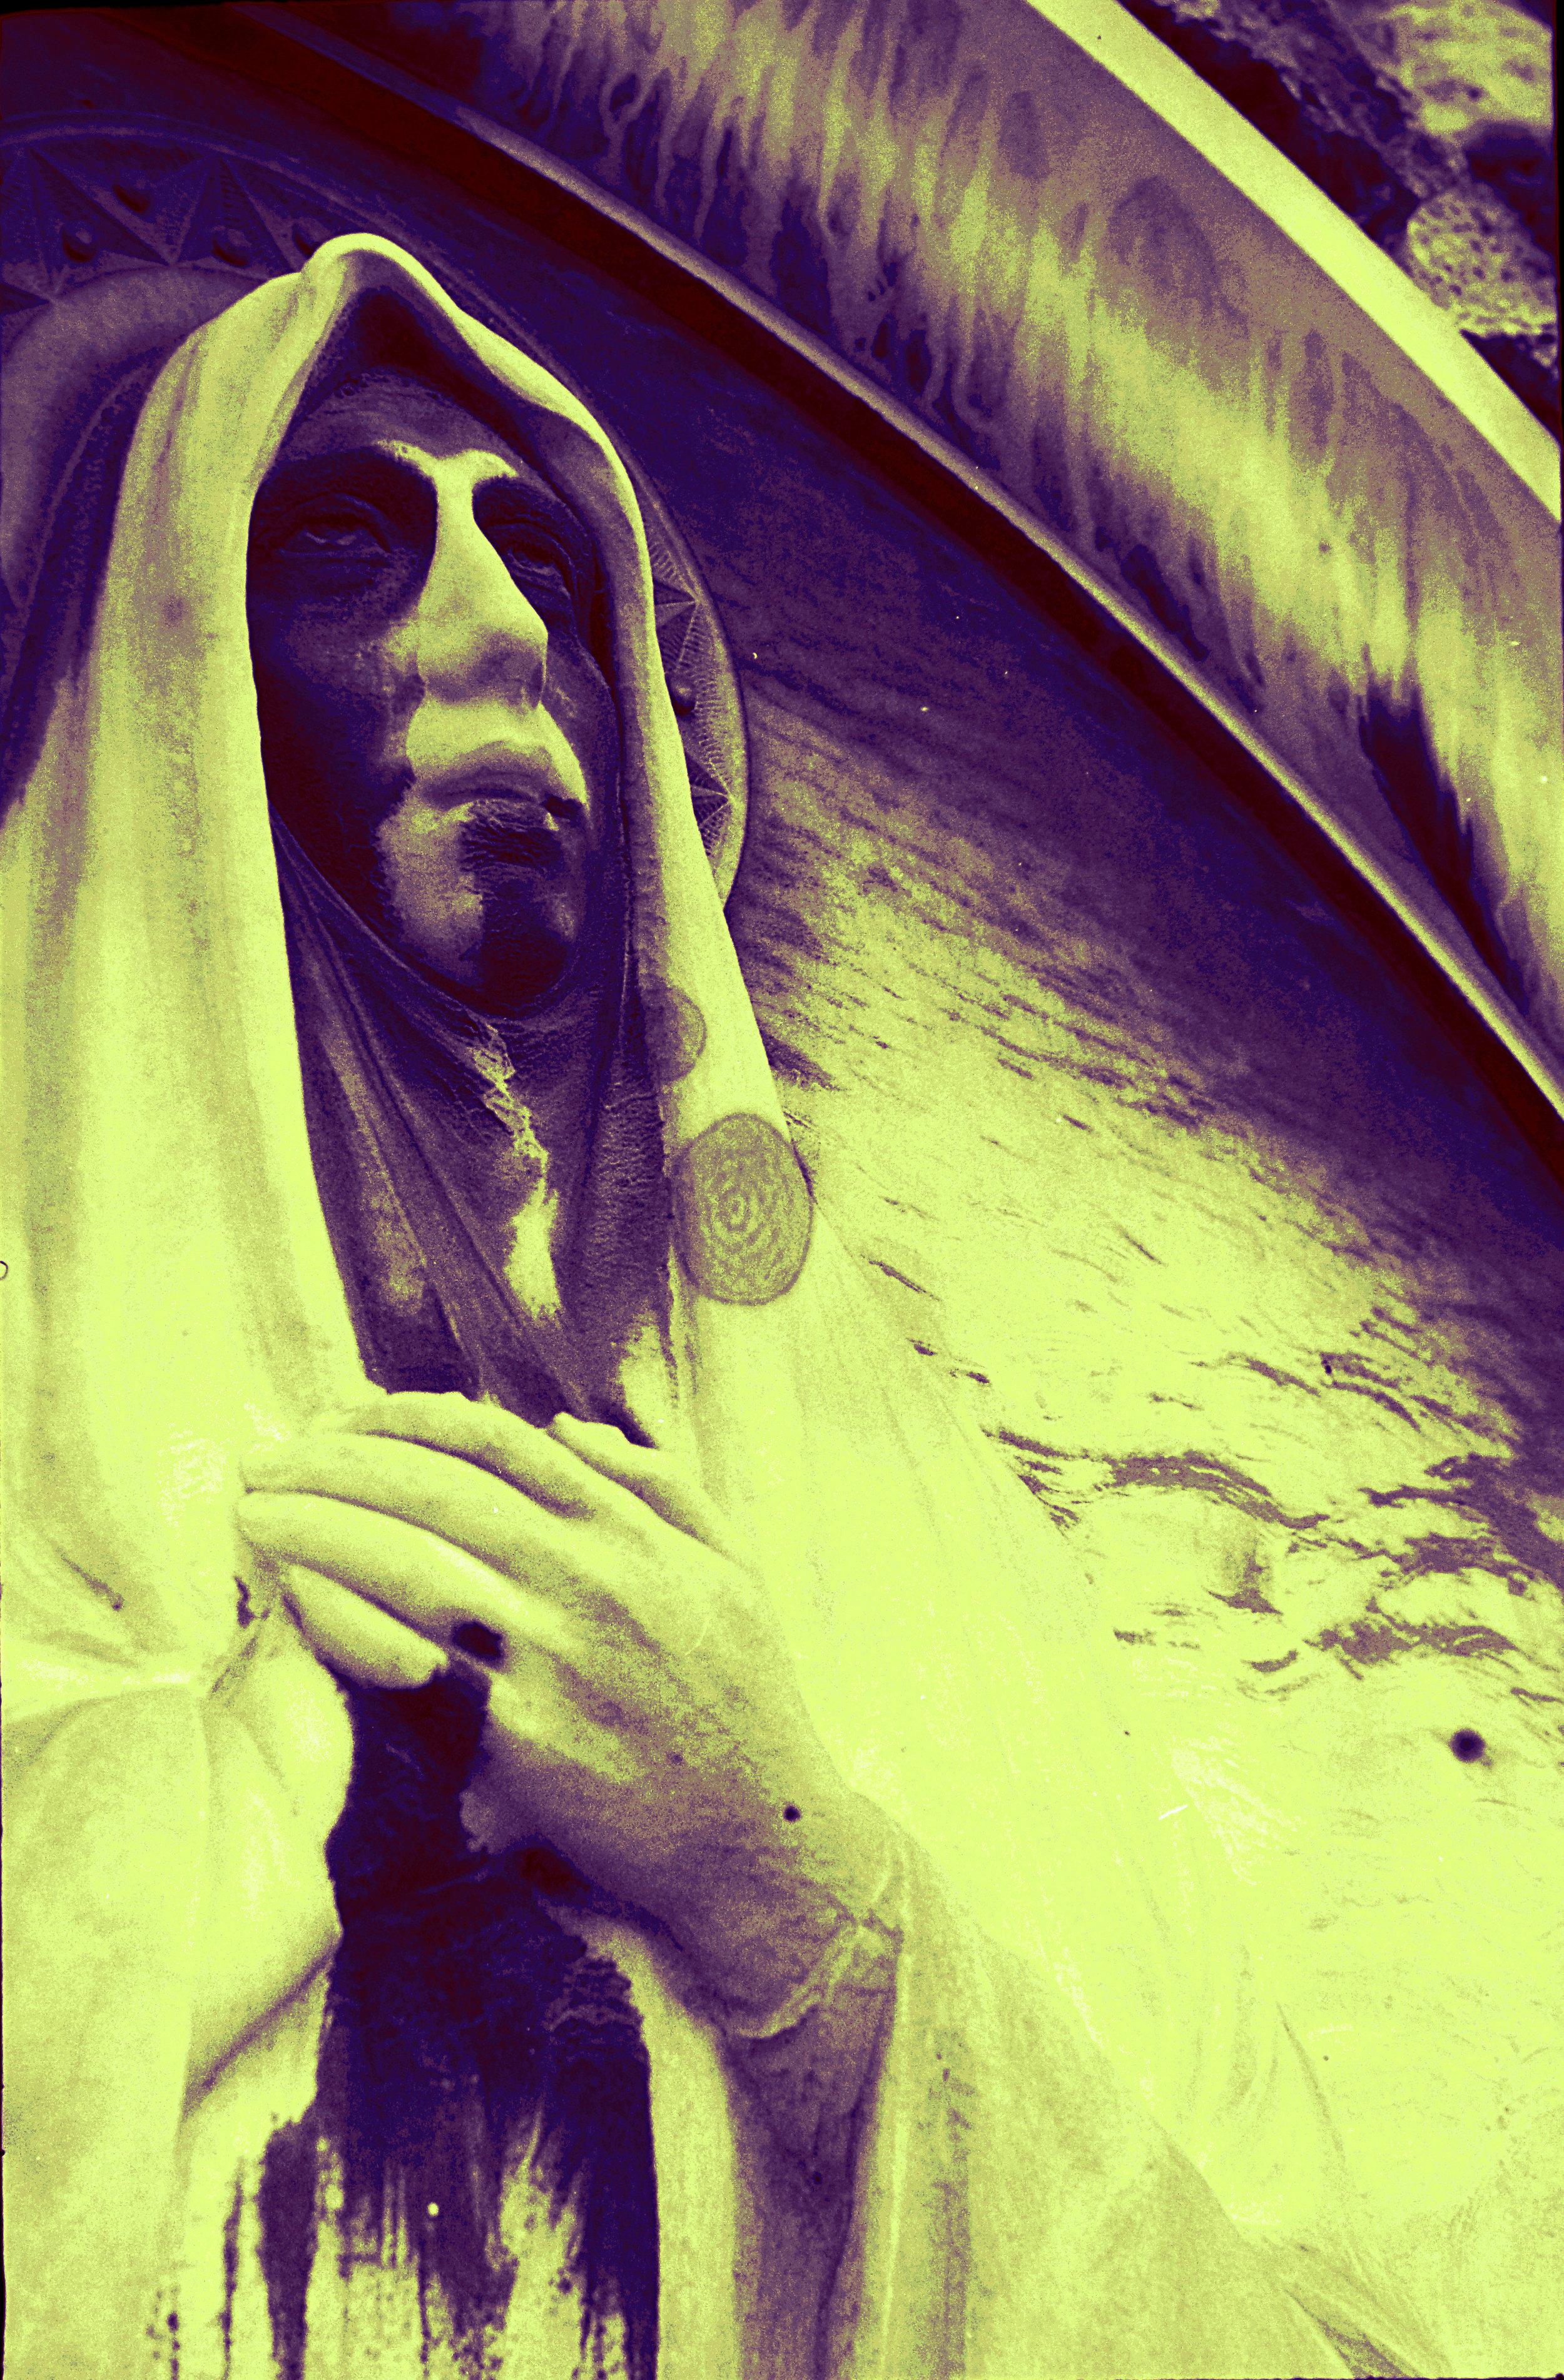 Welcome to the Dark Side   Kiev4+   Jupiter 8M   Afga Vista 200   Fernando Ruiz